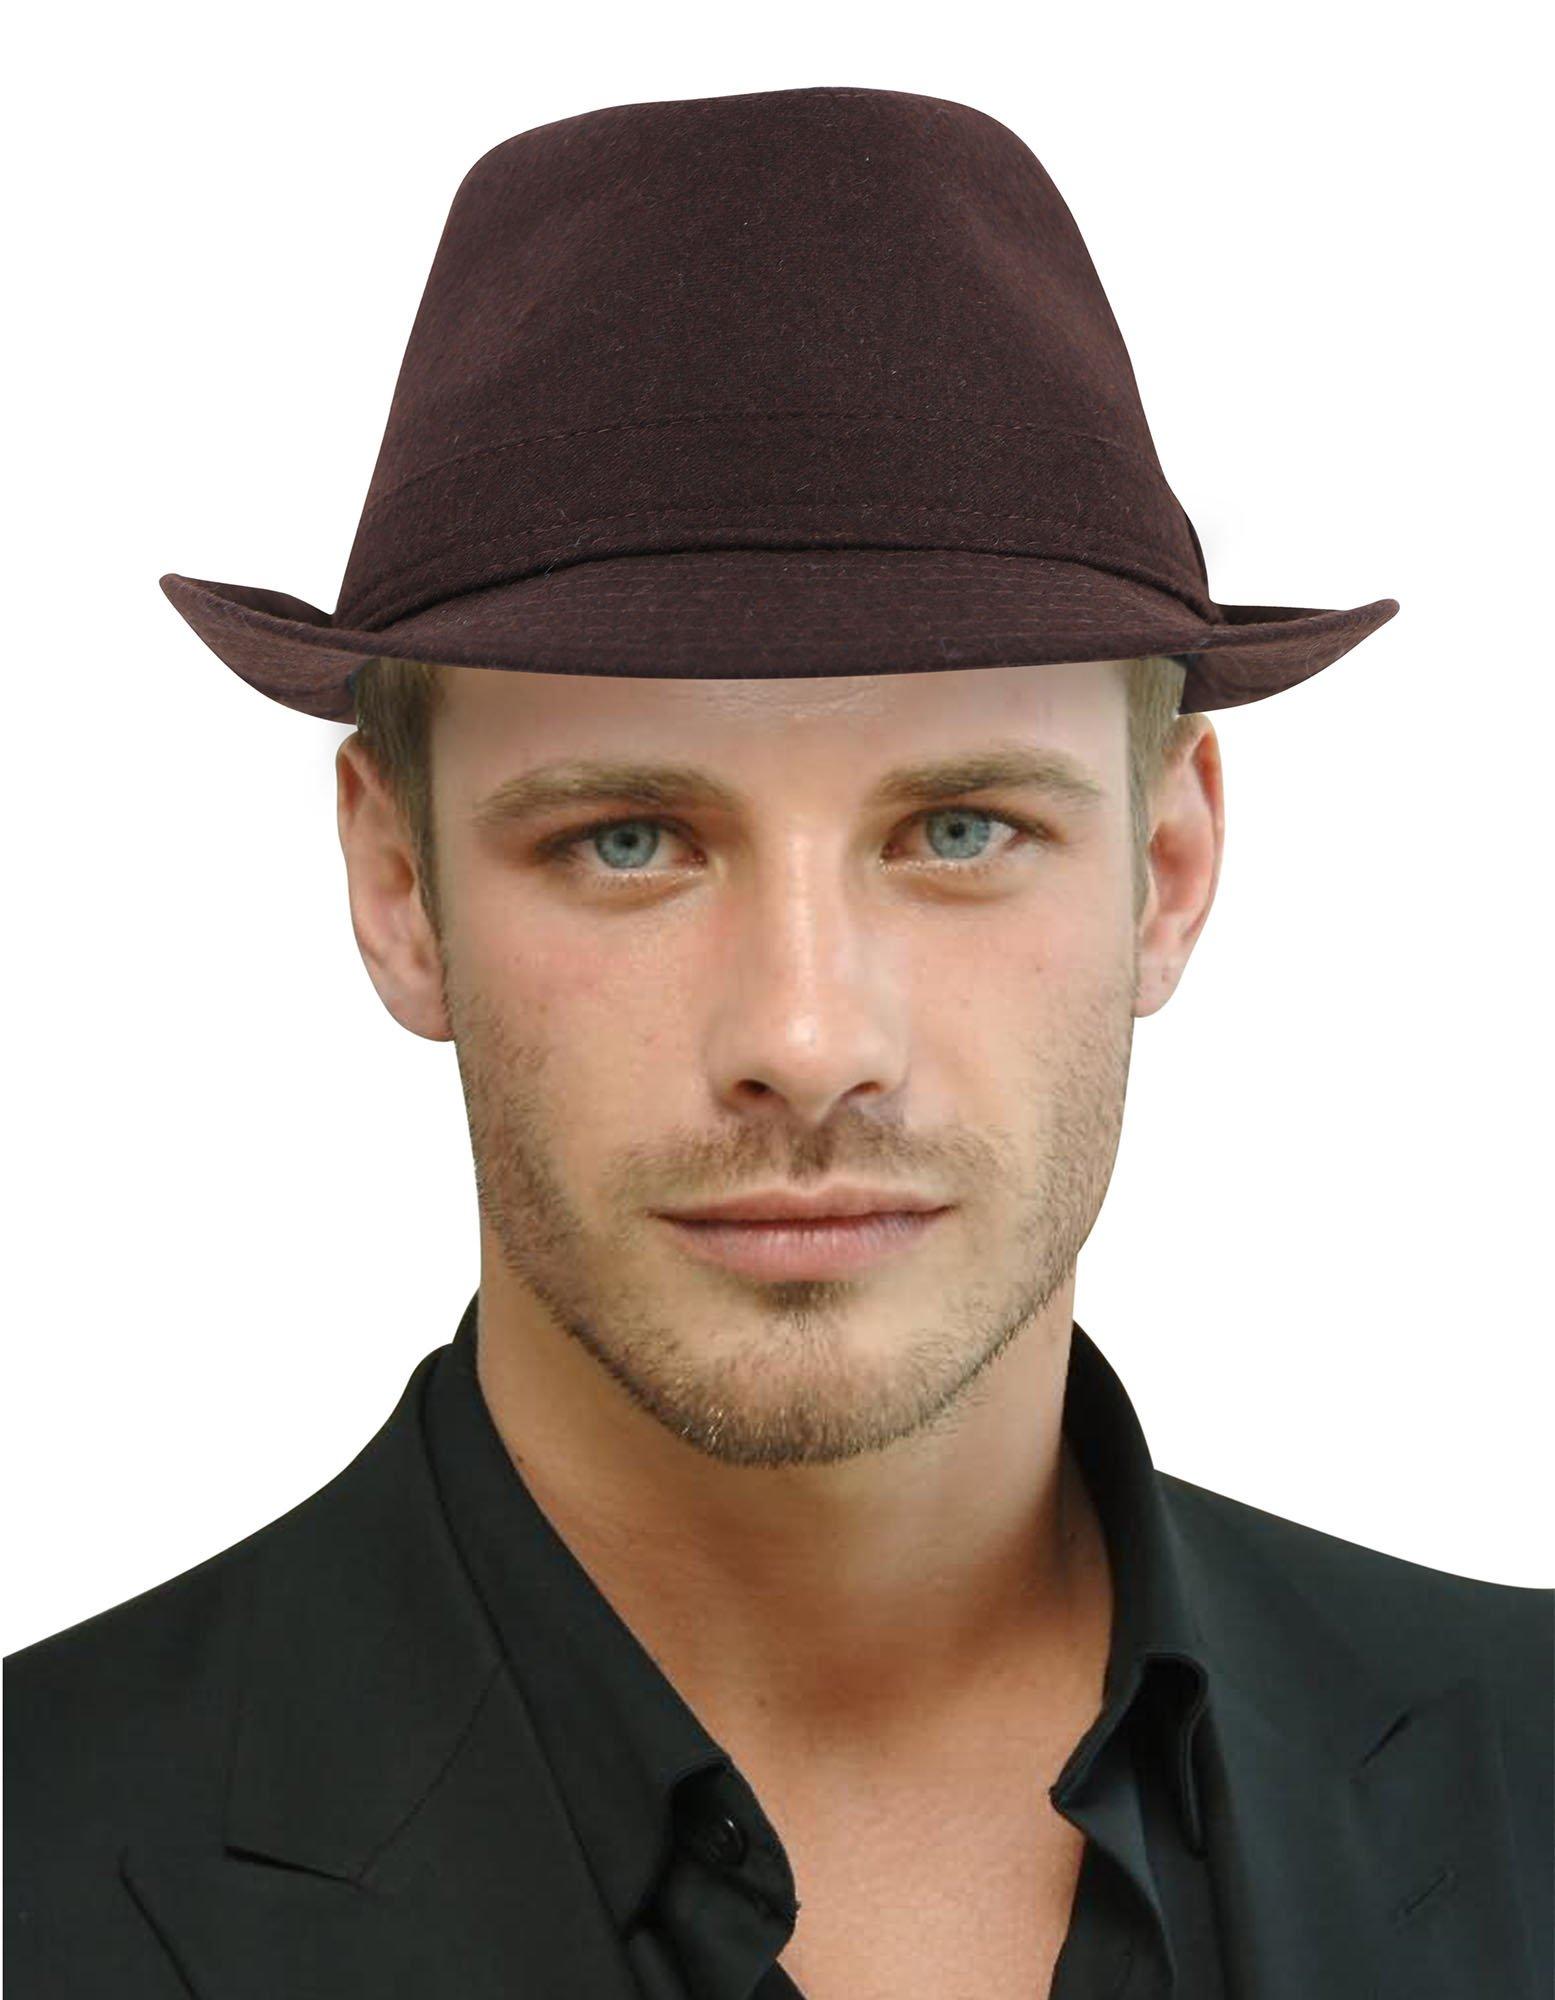 Fedora Hats for Women Classic Short Brim Manhattan Gangster Trilby Cap, Brown